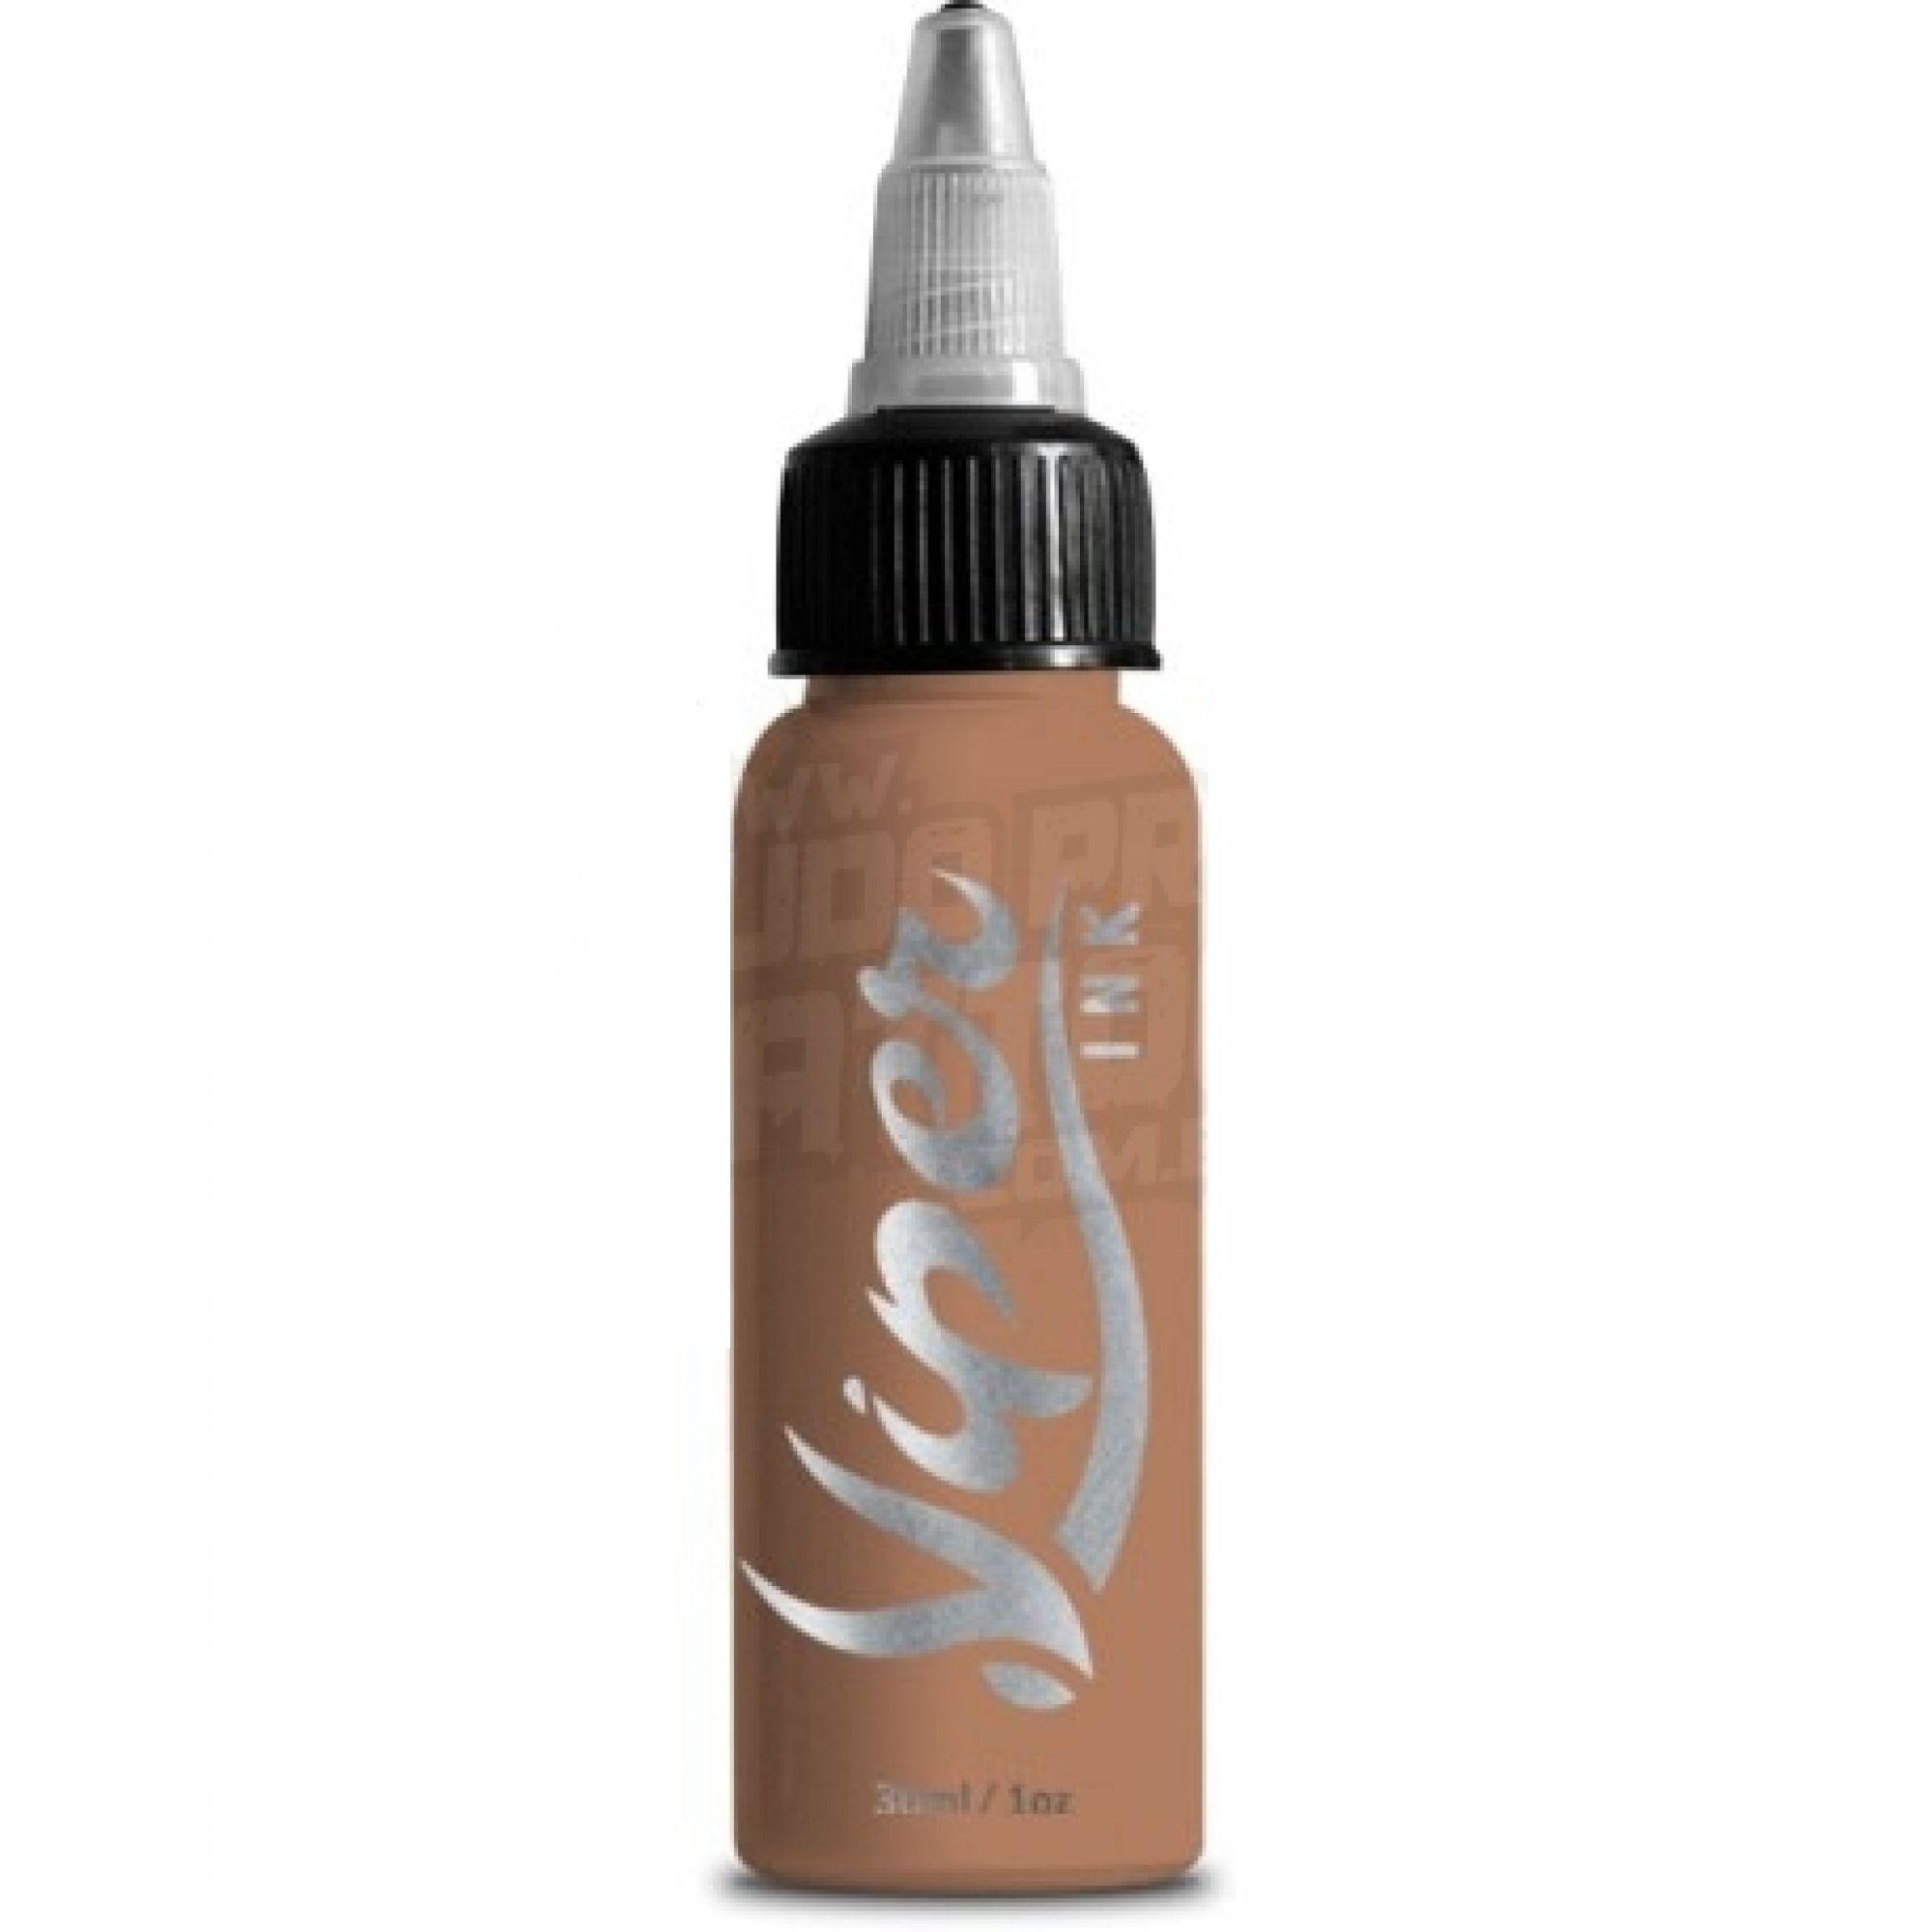 TINTA VIPER INK - INKA (30 ML)  - Misstética